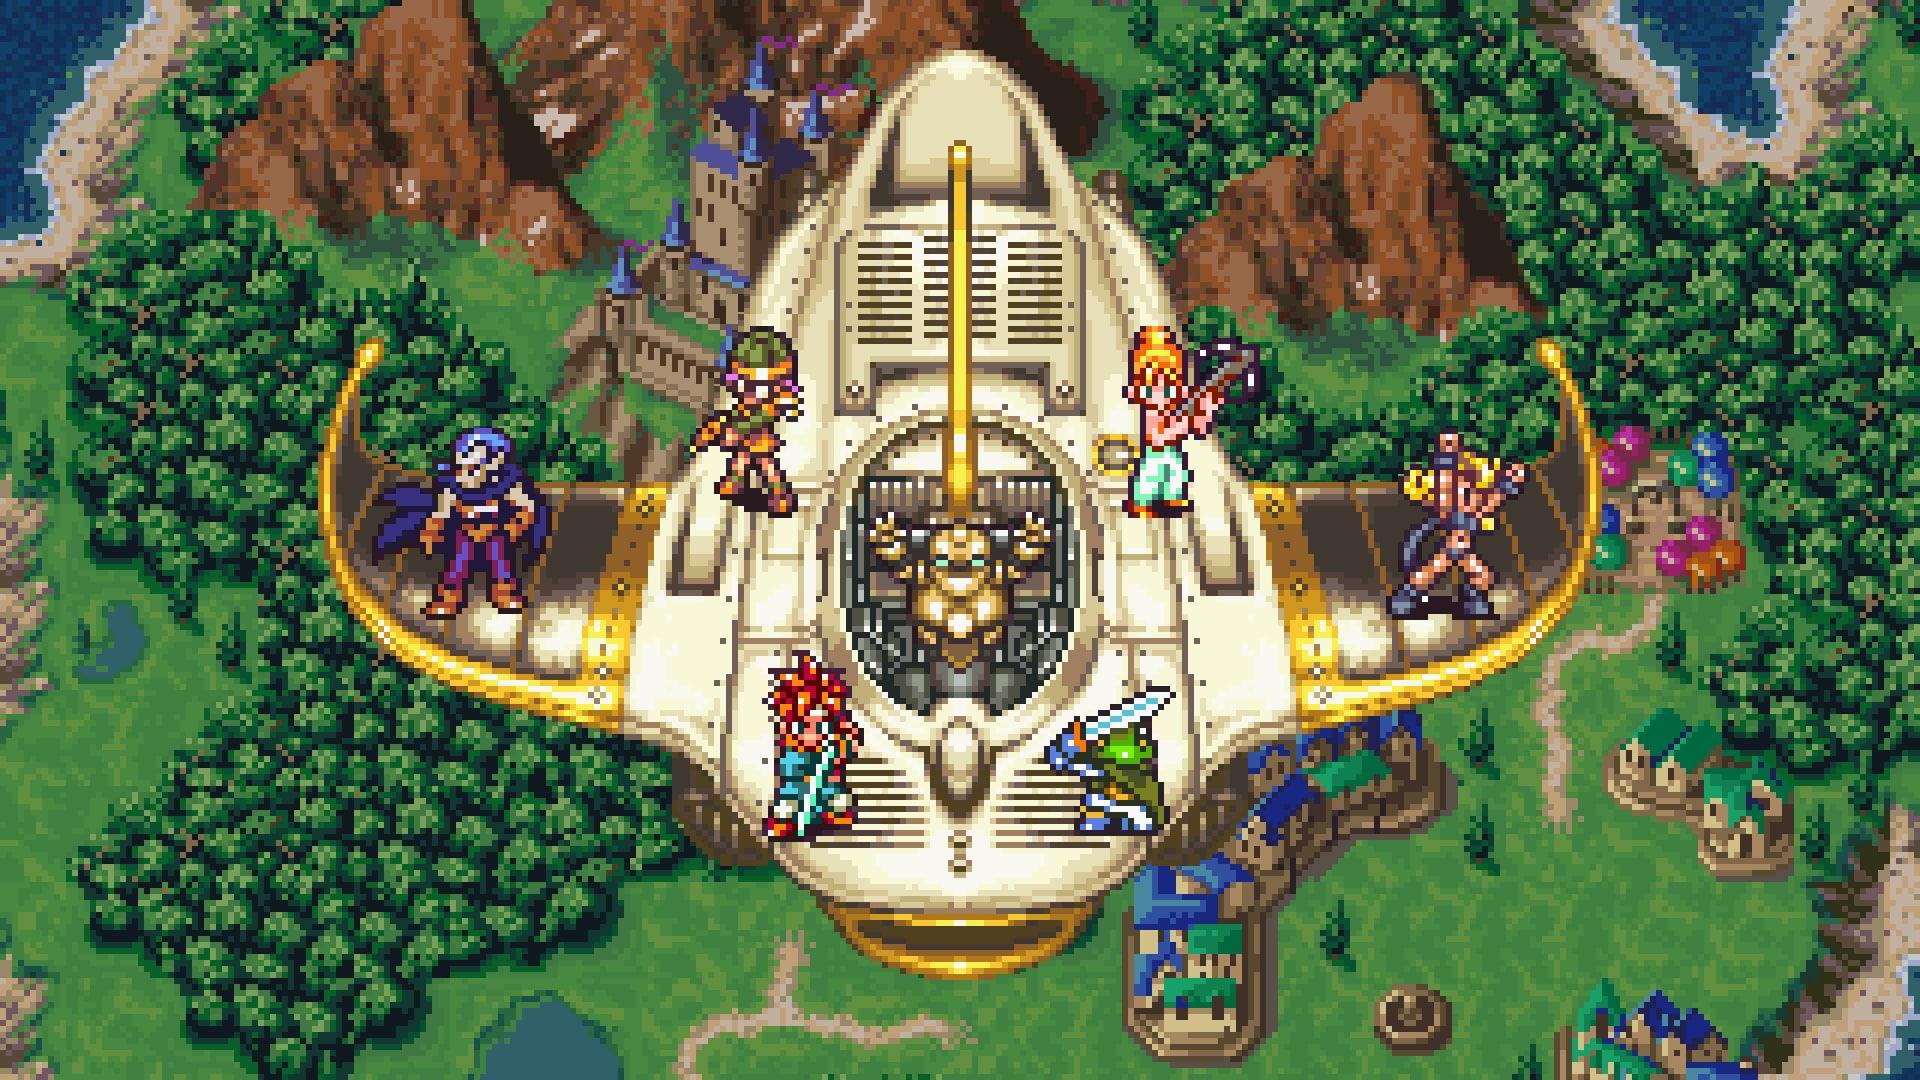 Chrono Trigger 25 years old 25th anniversary masterpiece RPG JRPG Square Squaresoft